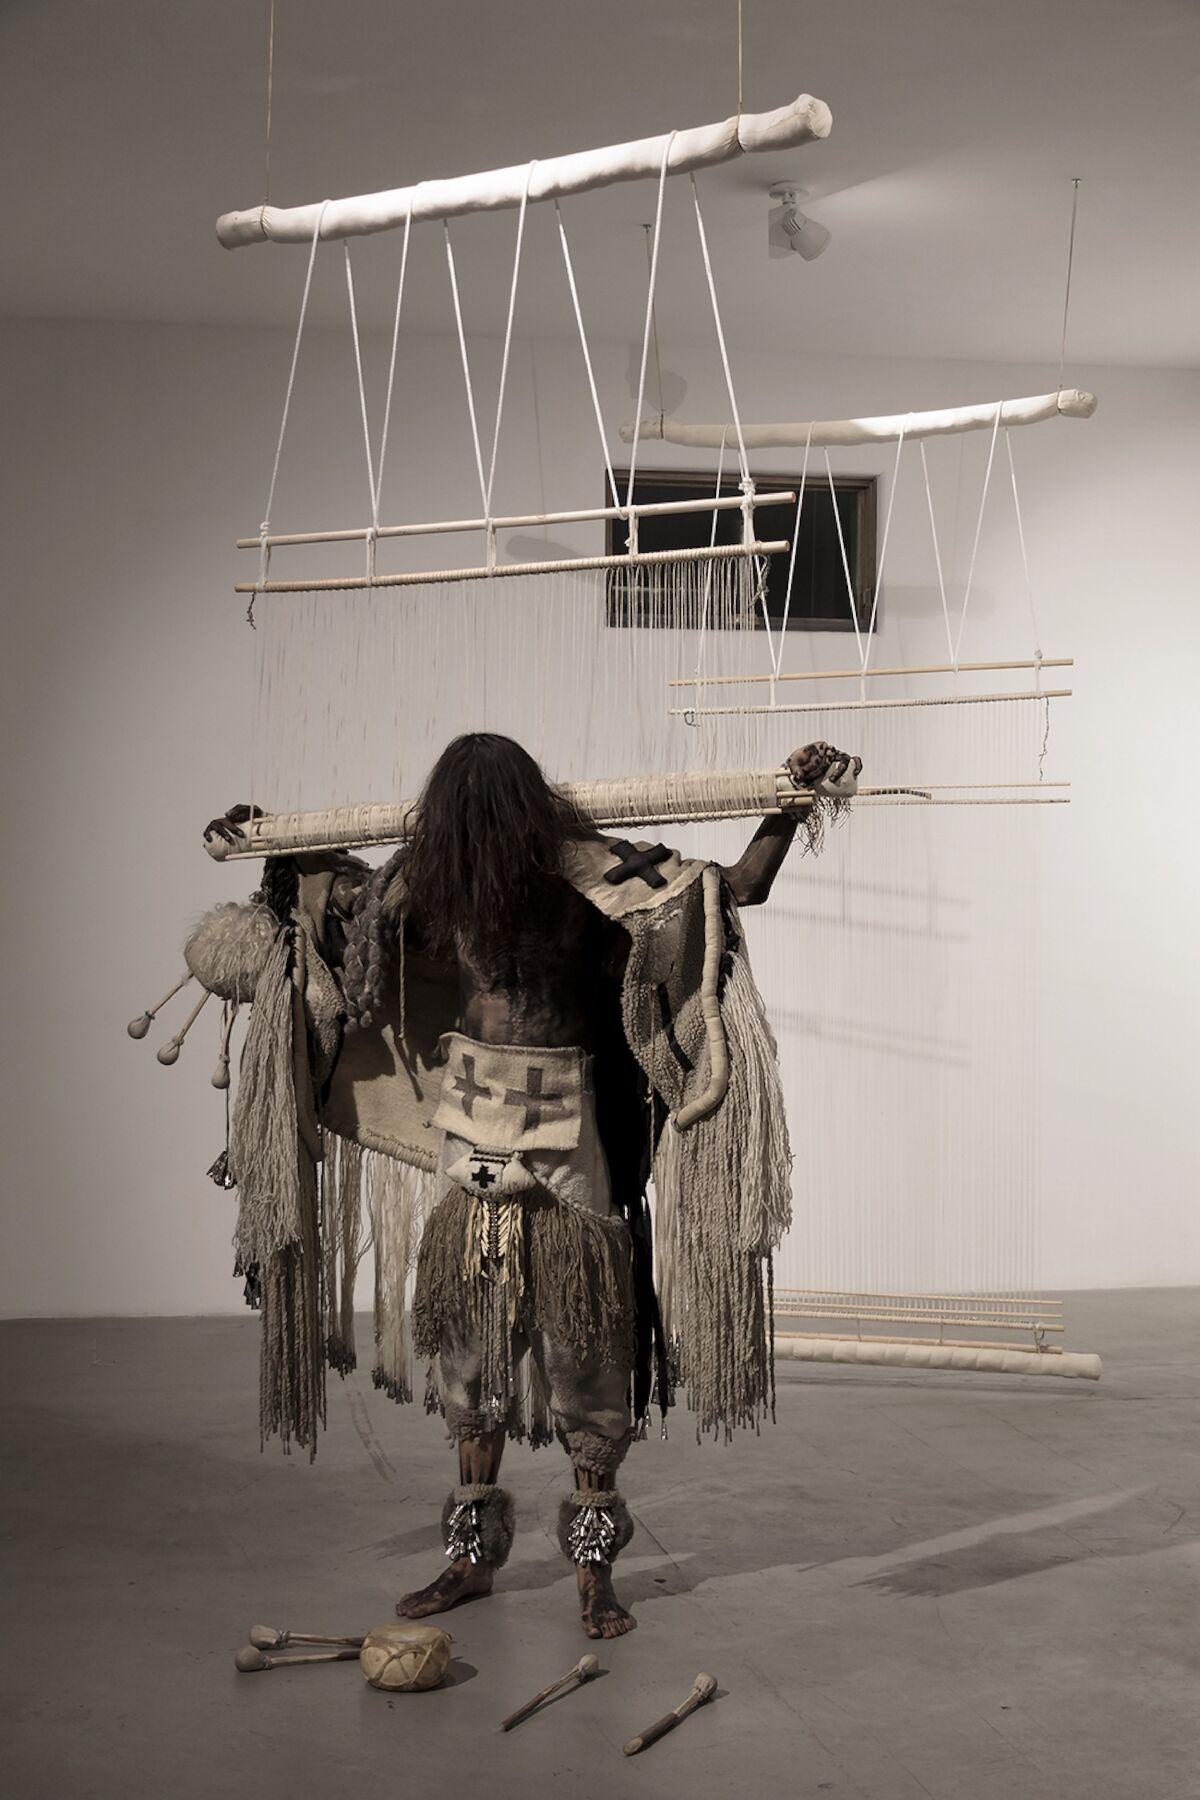 Eric-Paul Riege, dah 'iistl'o ́ [loomz], weaving dance (fig.1), 2018. Photo by Rapheal Begay. Courtesy of artist.